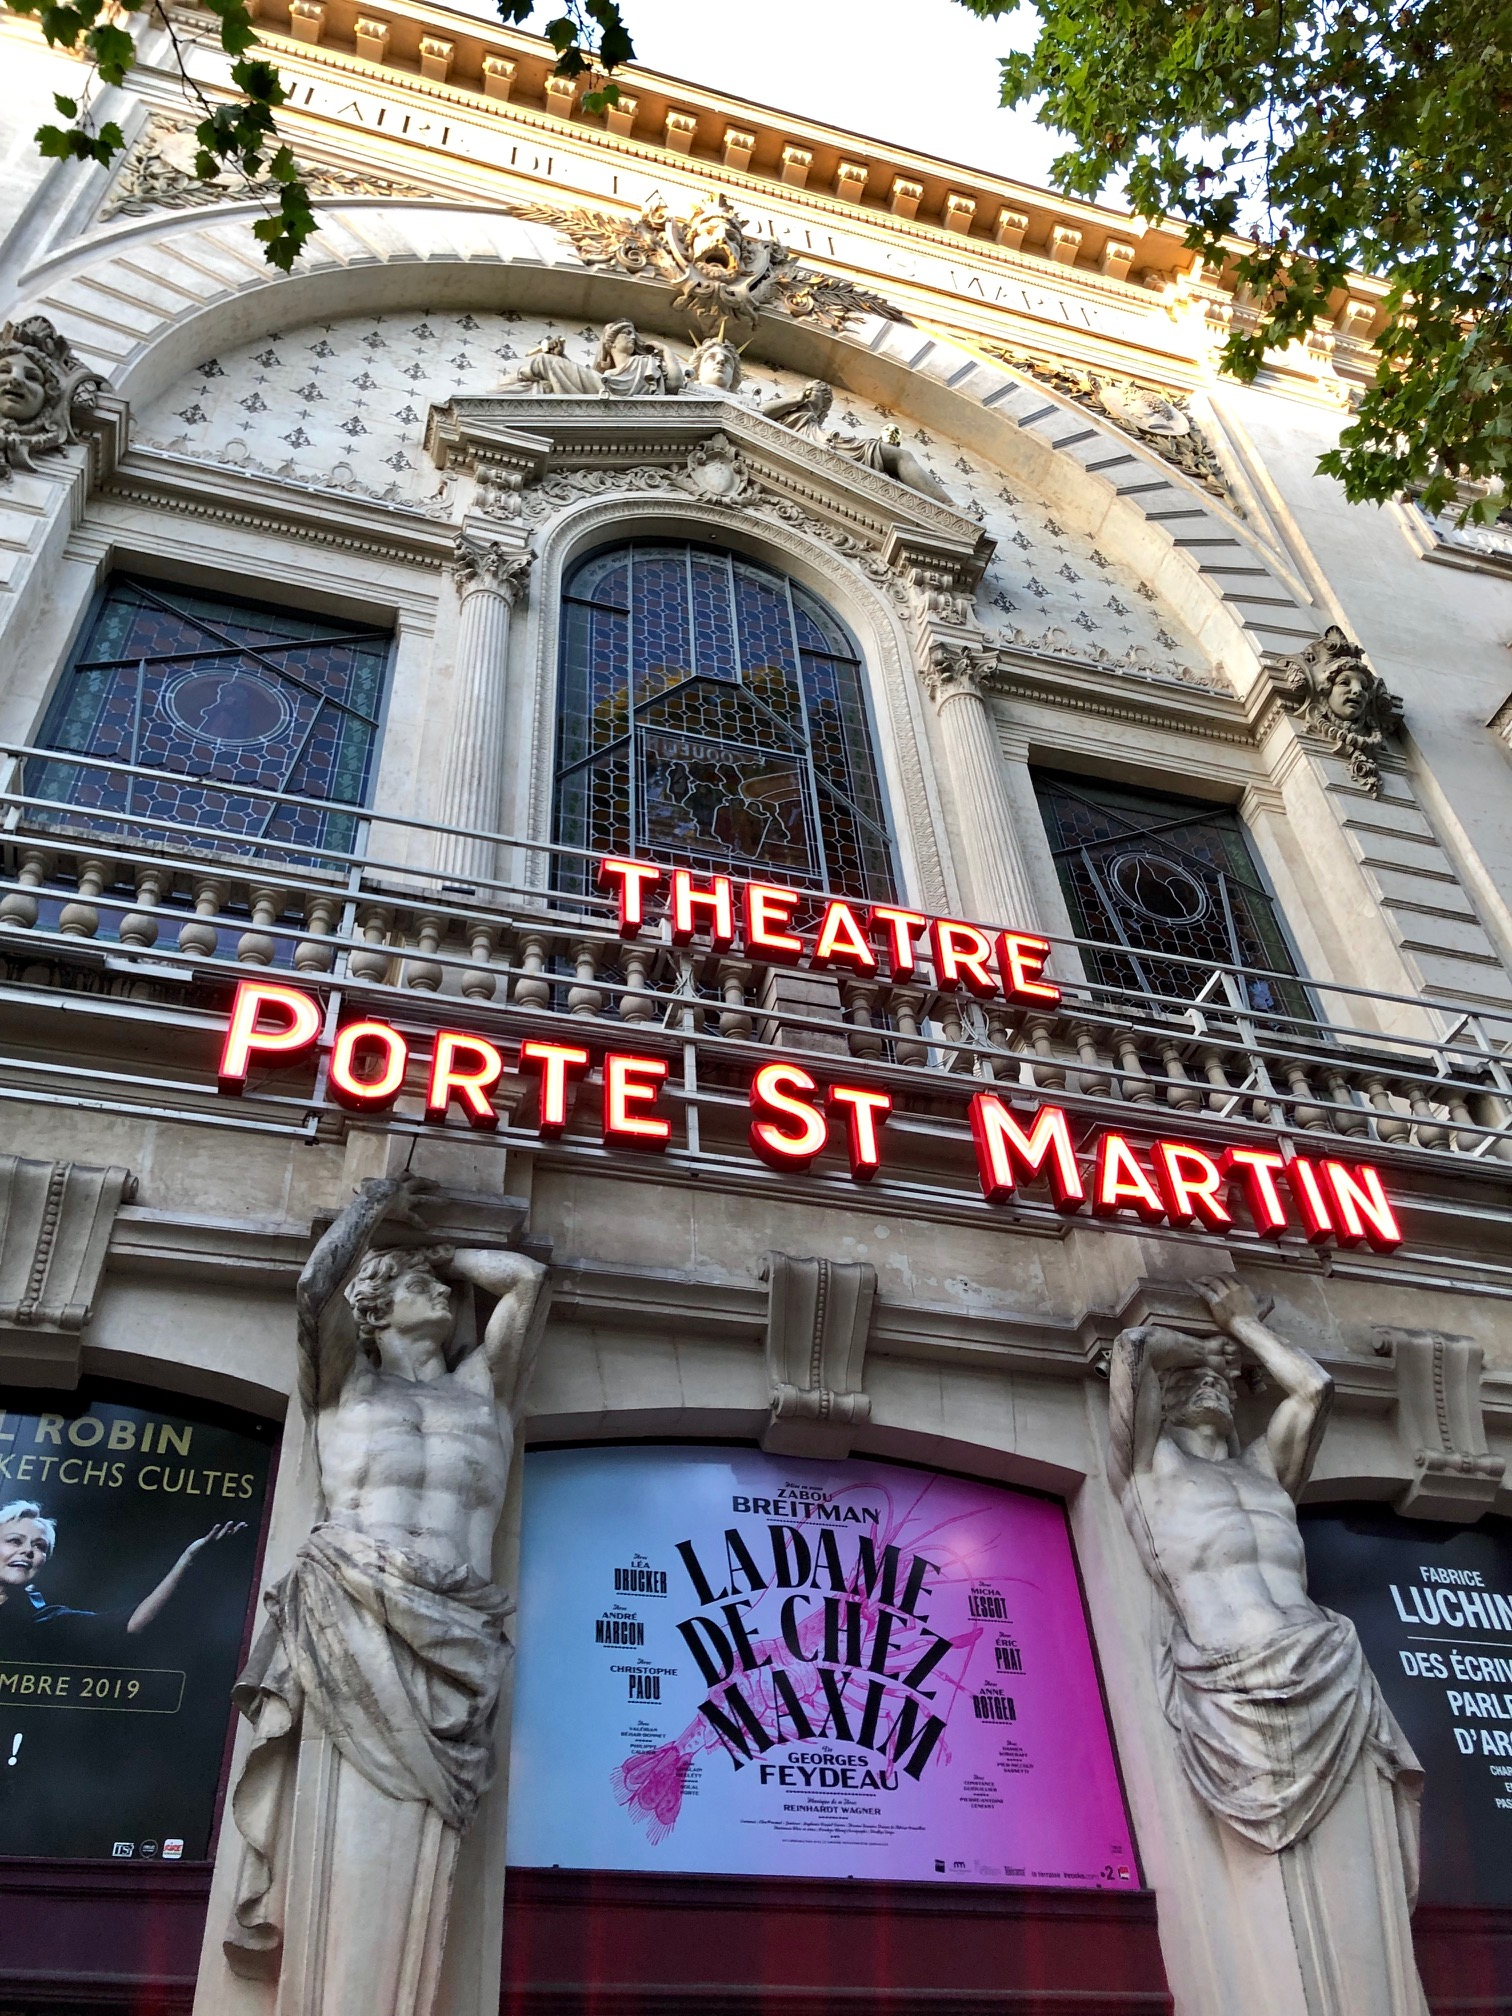 La Dame De Chez Maxim Porte Saint Martin : maxim, porte, saint, martin, Maxim, Zabou, Breitman, Drucker, Extra